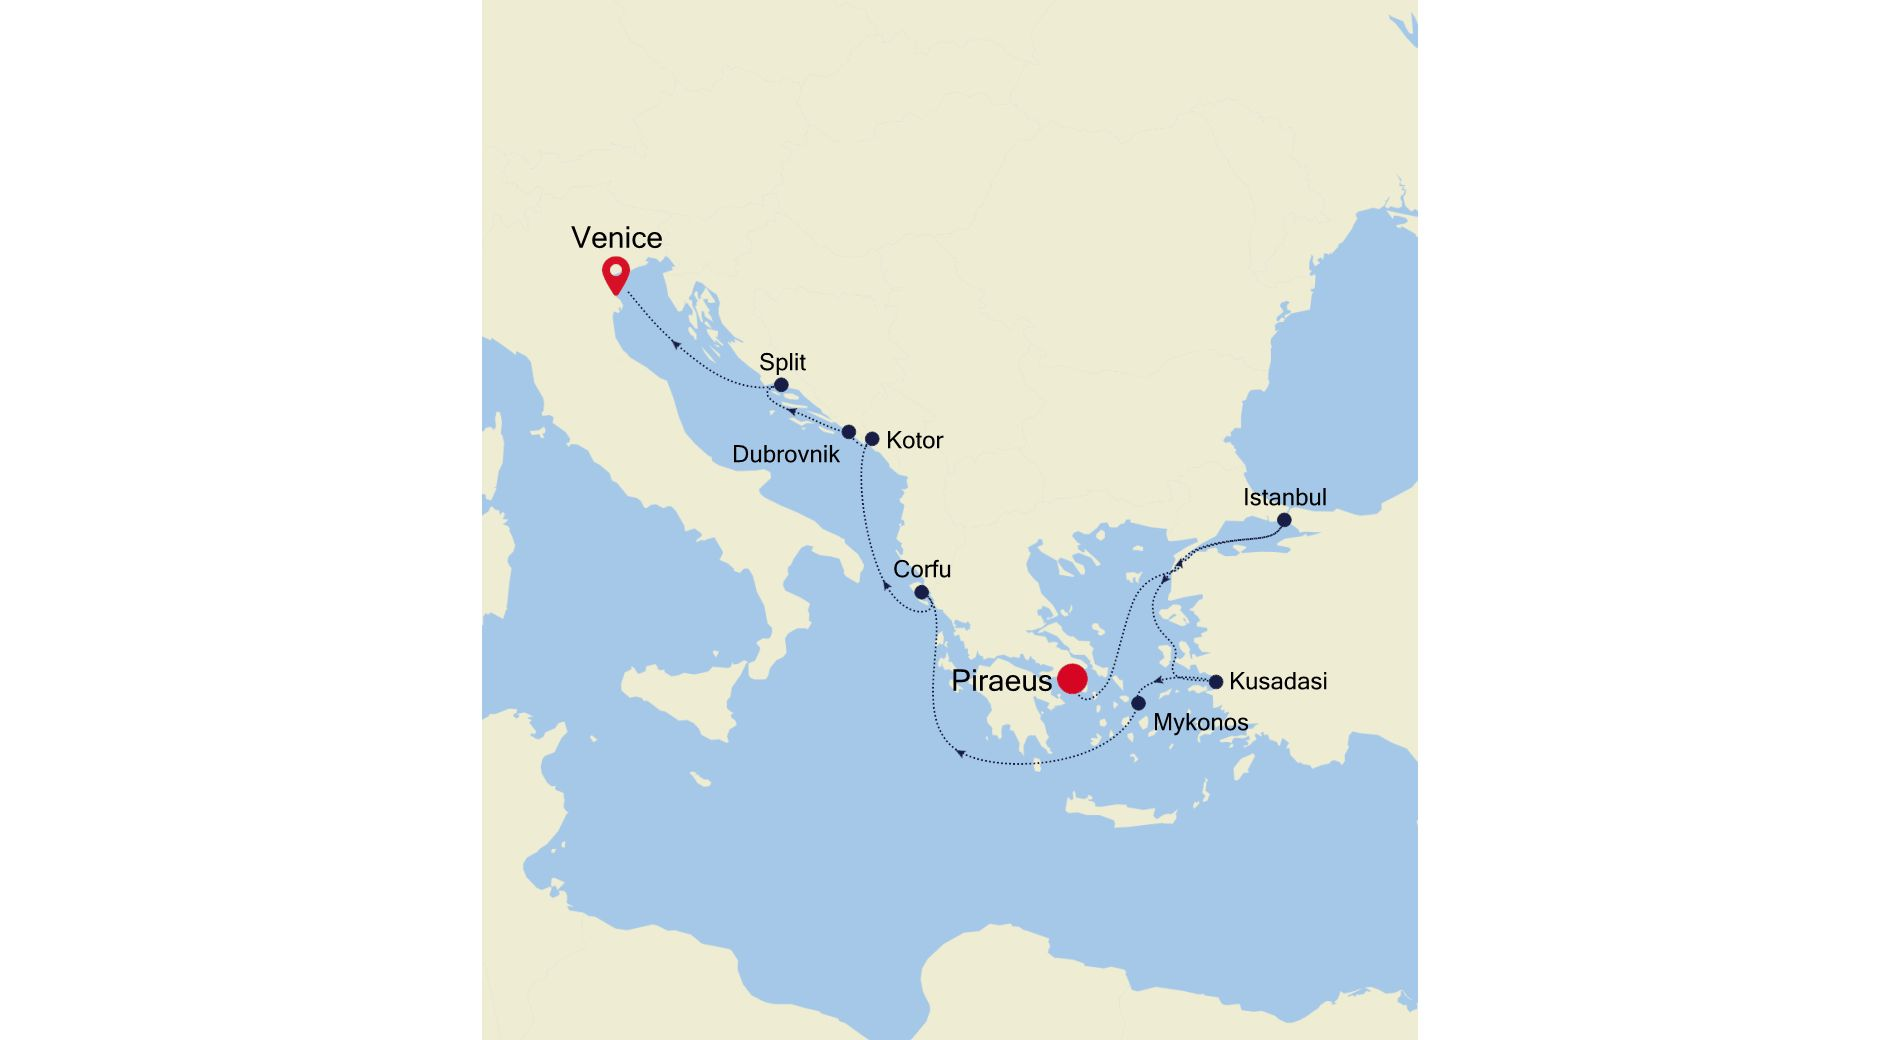 SS200802012 - Piraeus a Venice